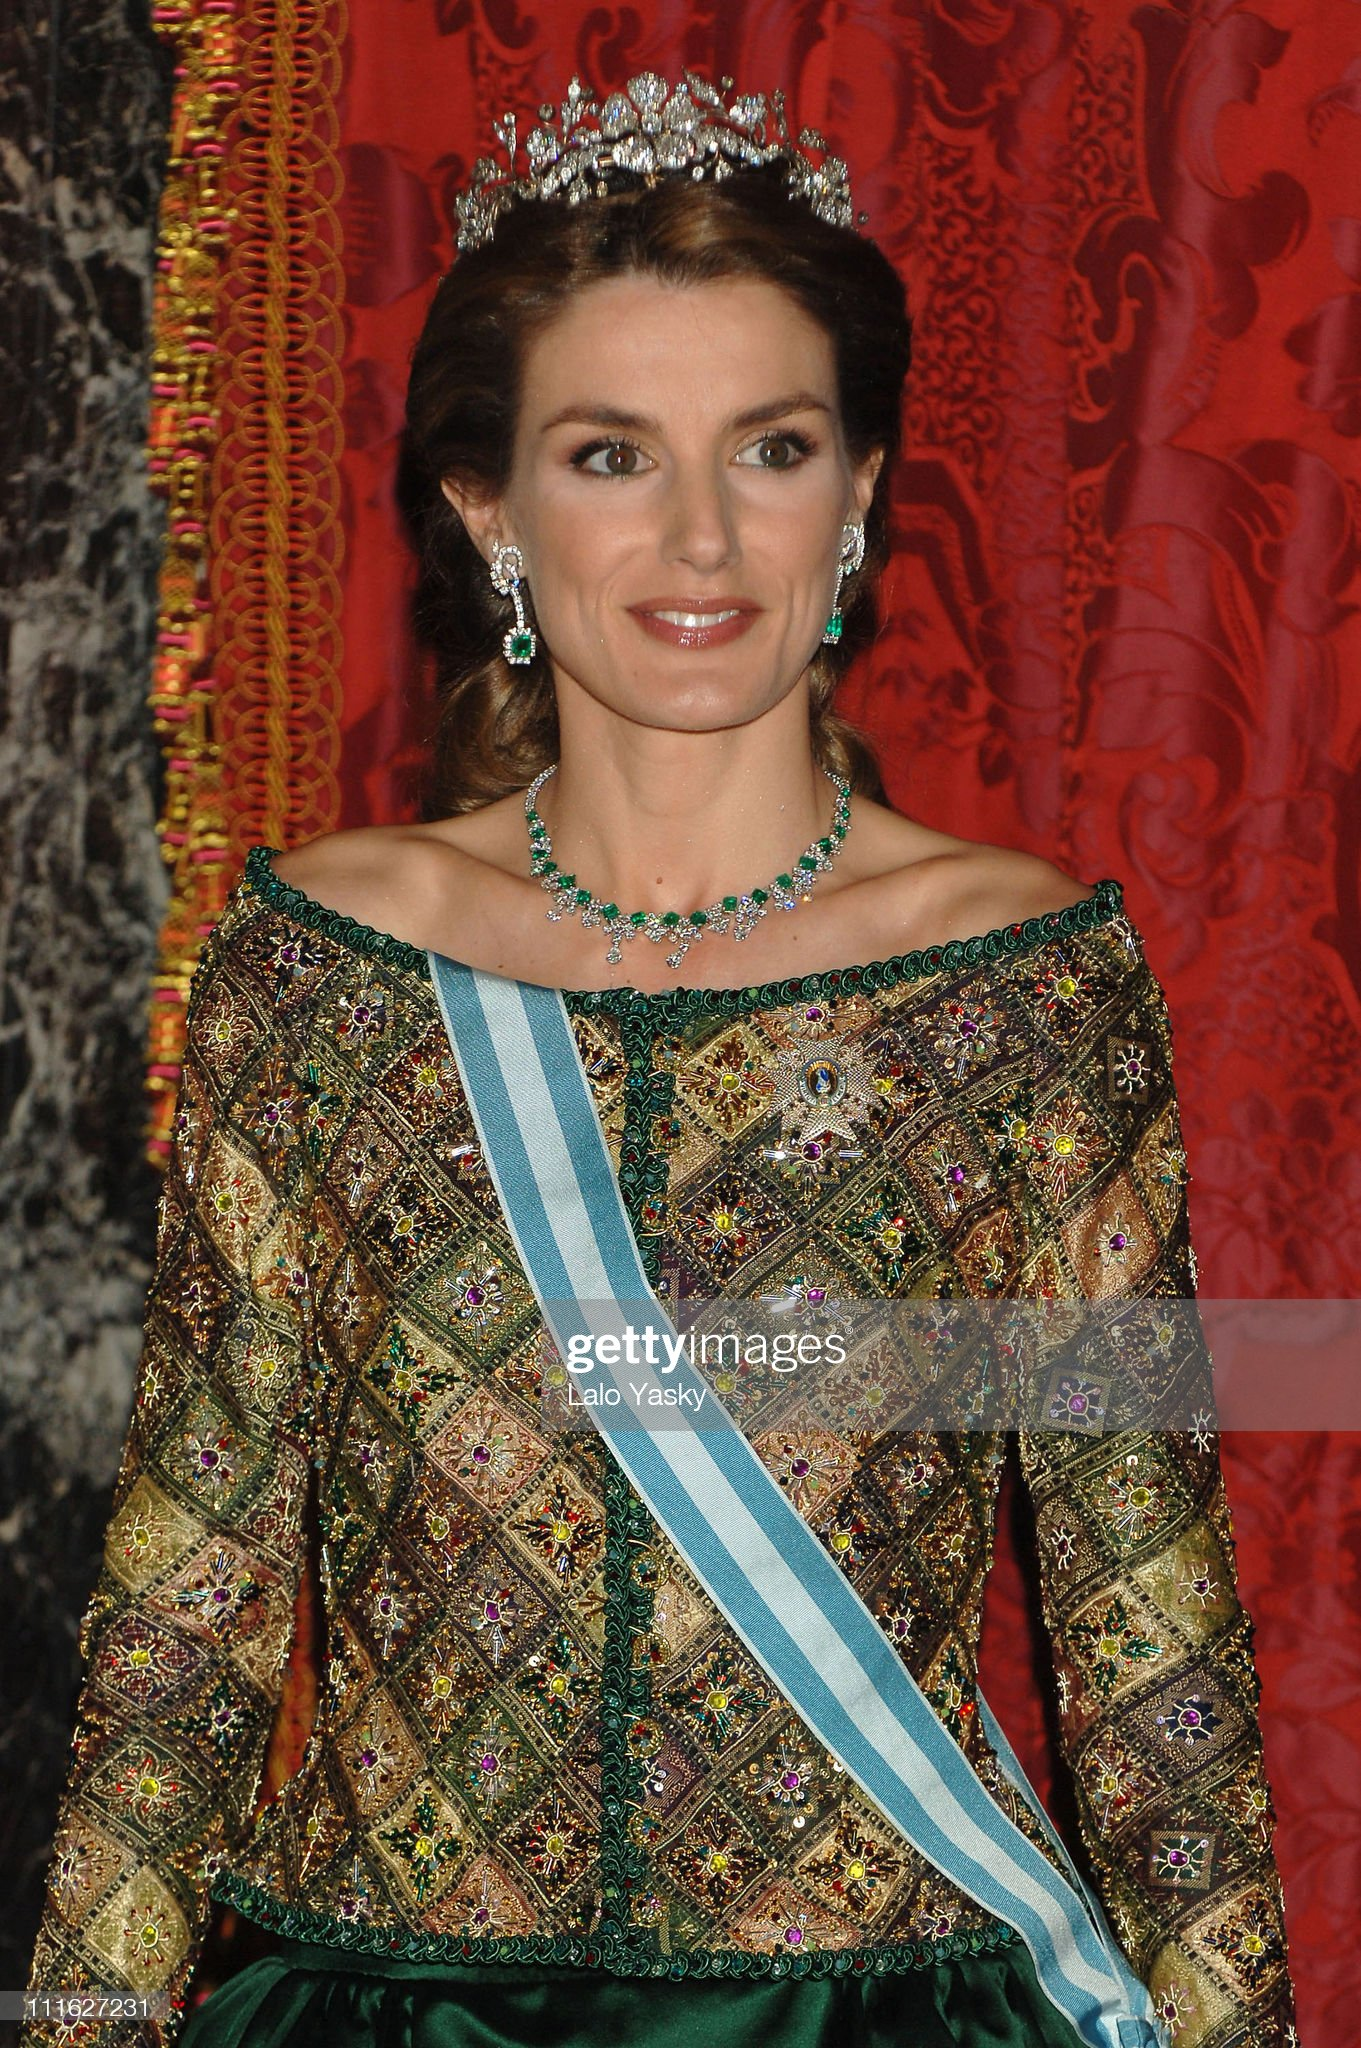 Spanish Royals Receive Vladimir Putin and Wife - February 9, 2006 : News Photo